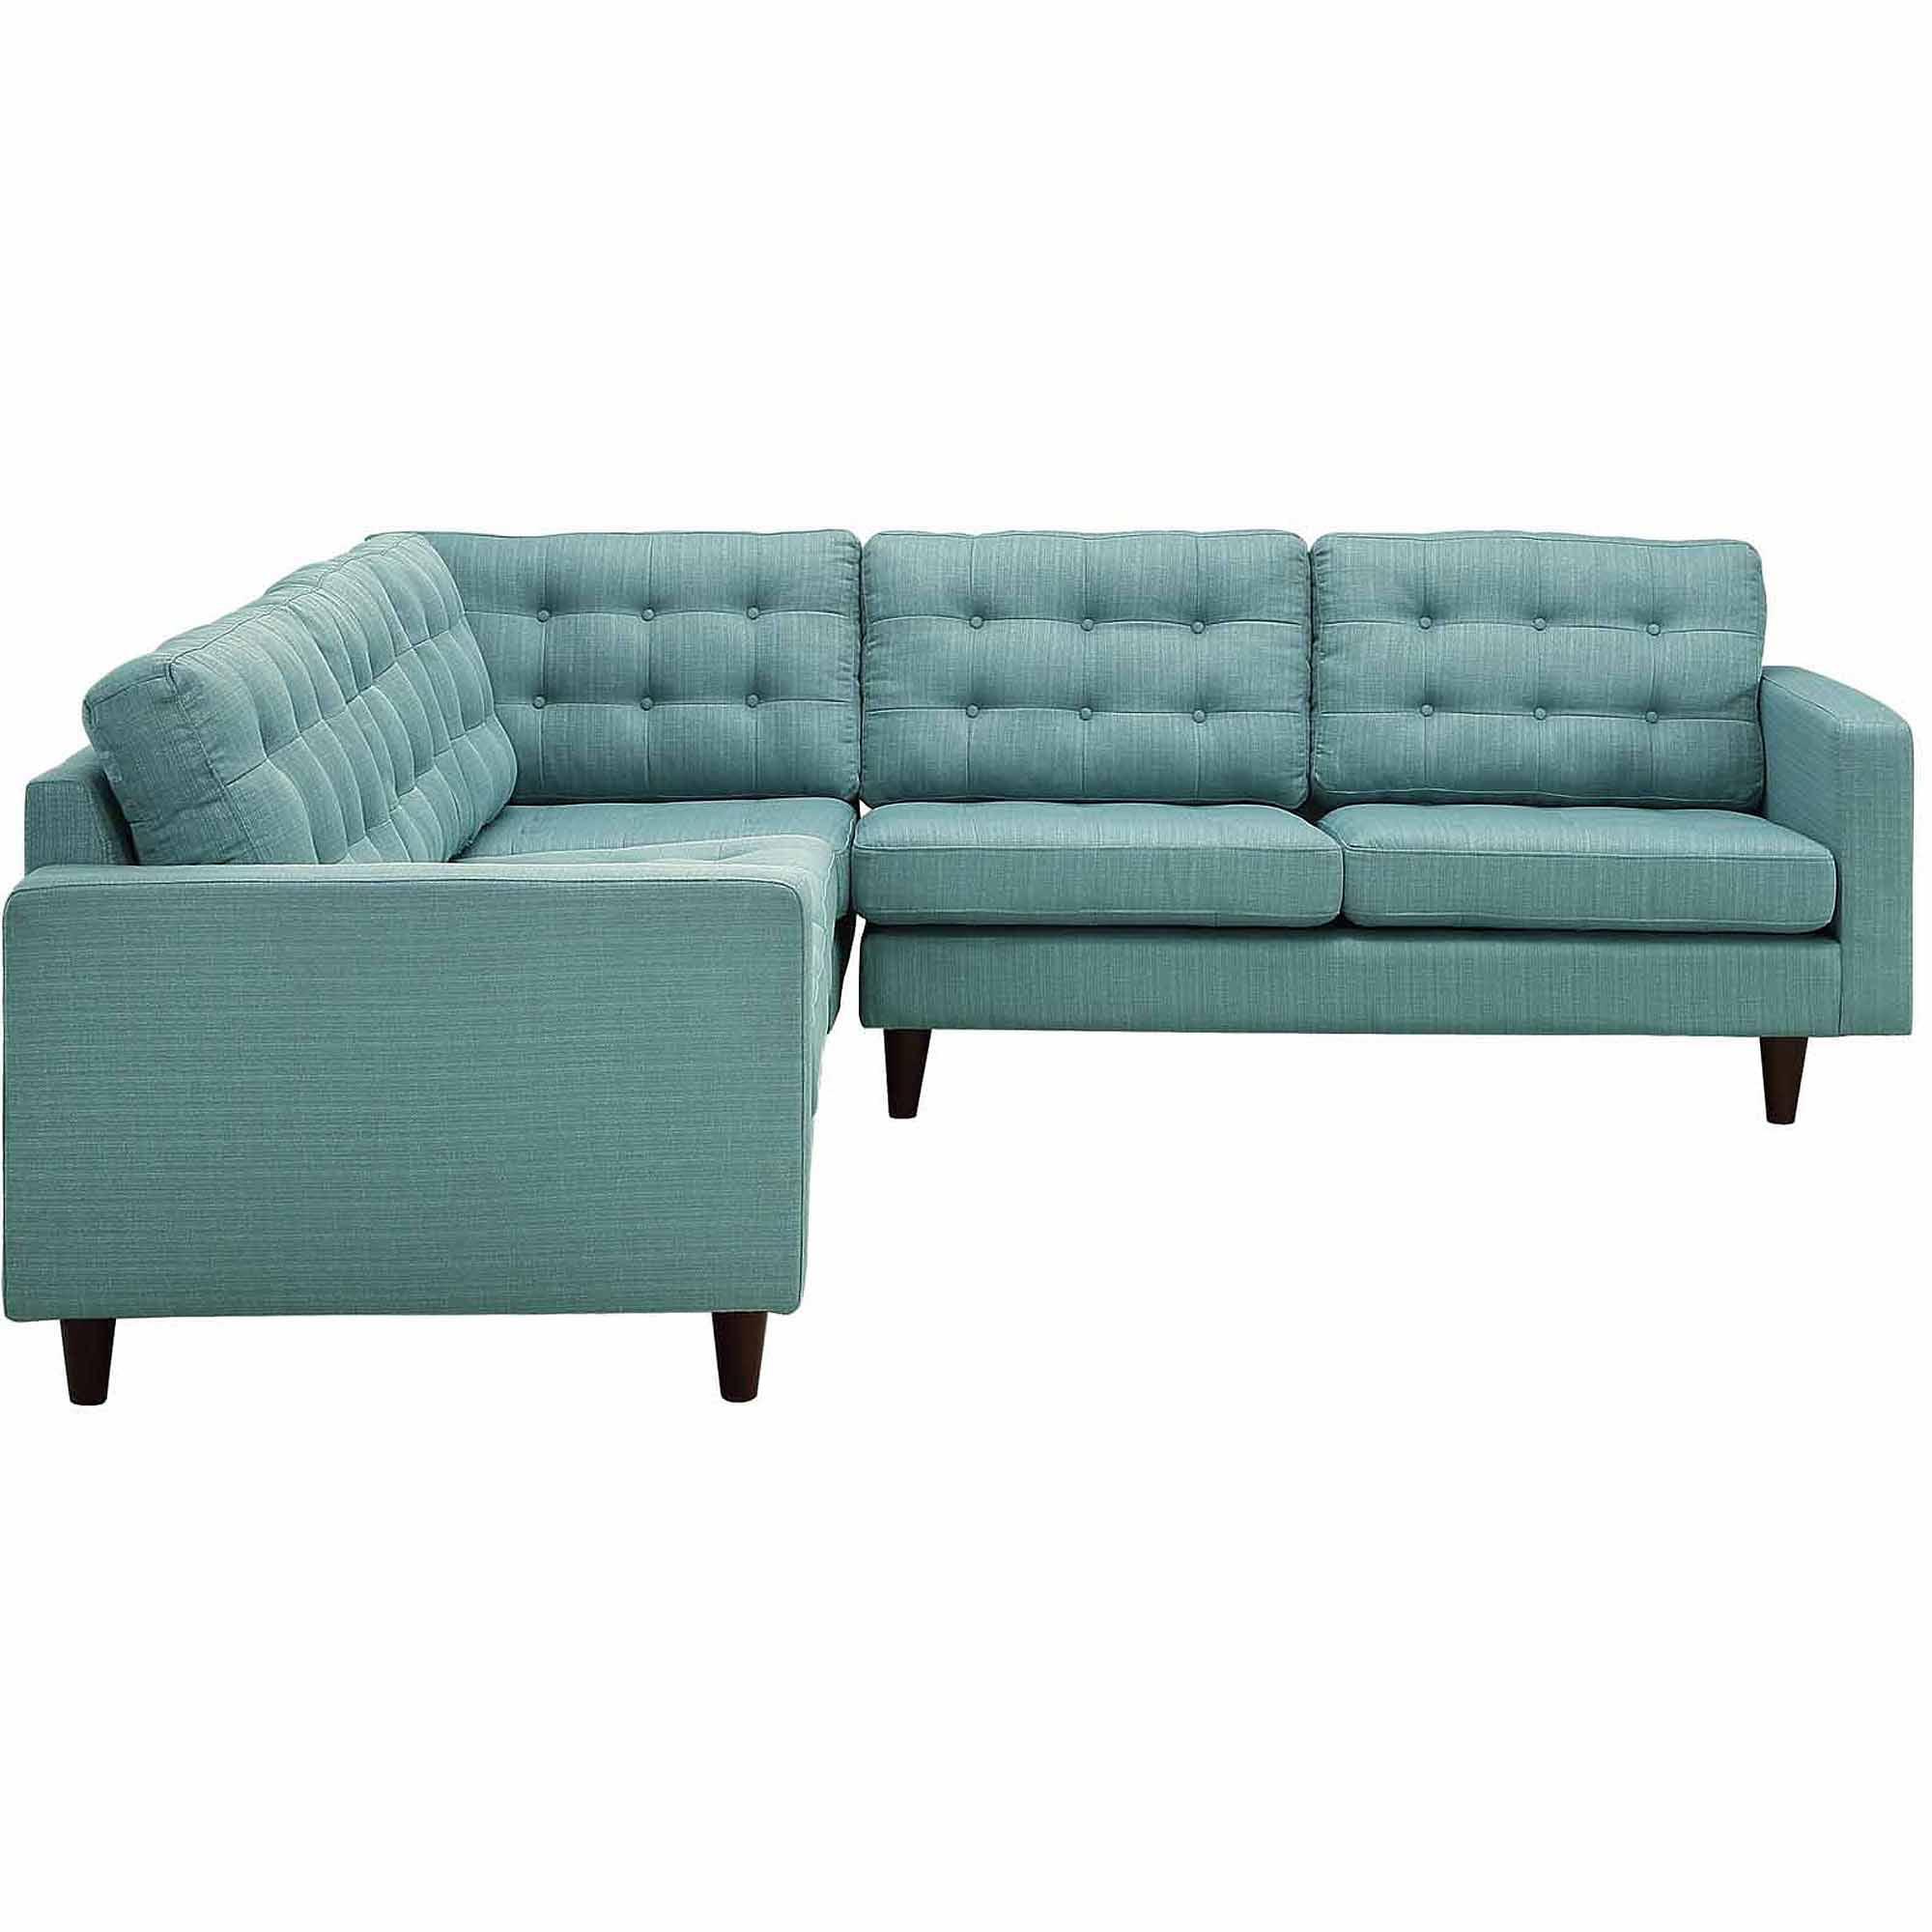 Modway Empress 3 Piece Fabric Sectional Sofa Set Multiple Colors